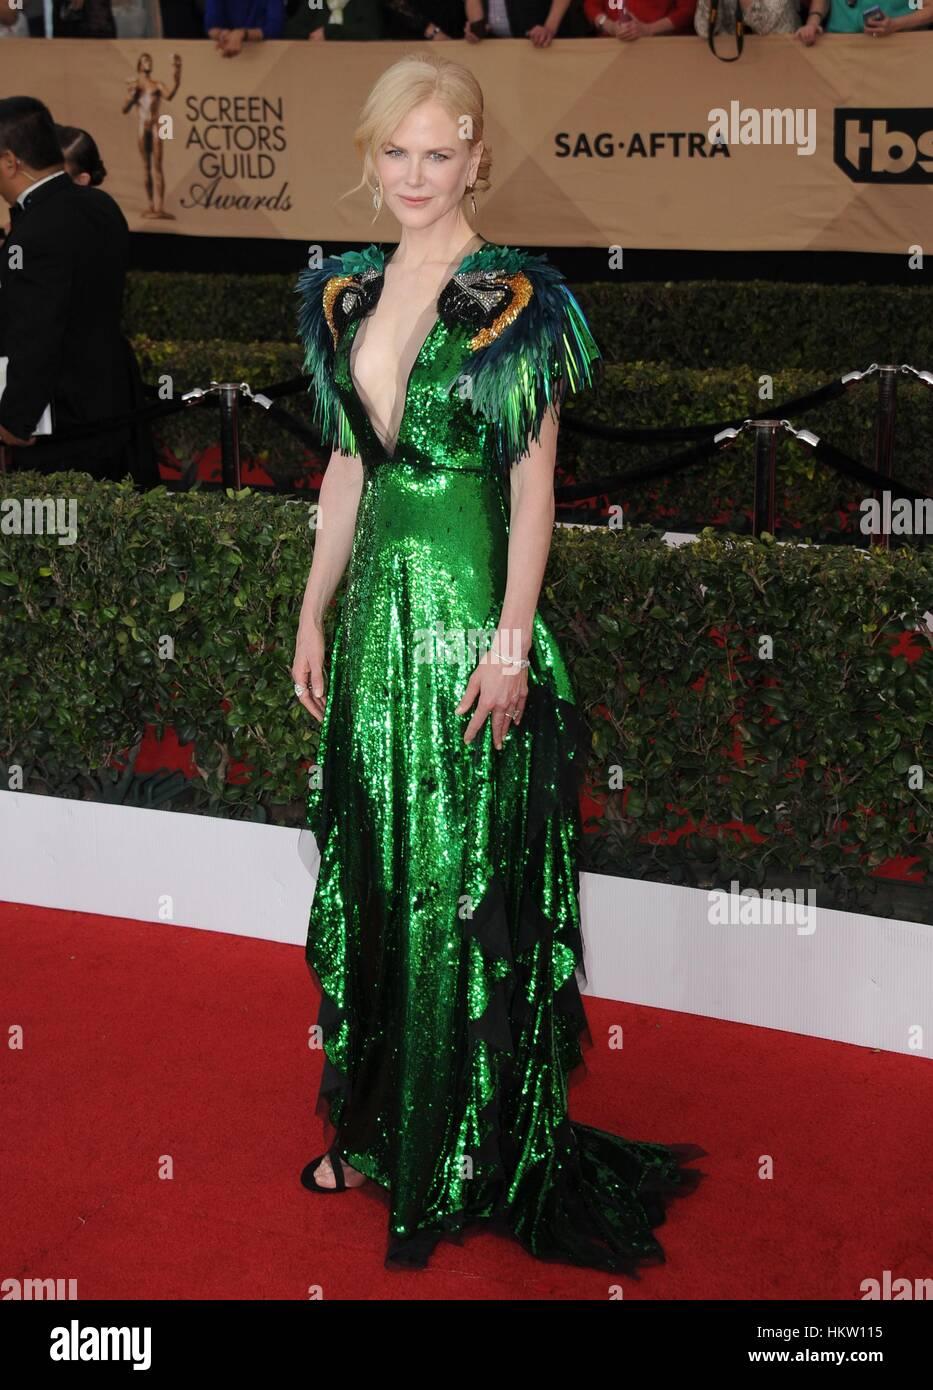 Los Angeles, CA, USA. 29. Januar 2017. Nicole Kidman im Ankunftsbereich für 23. Annual Screen Actors Guild Awards, Stockfoto